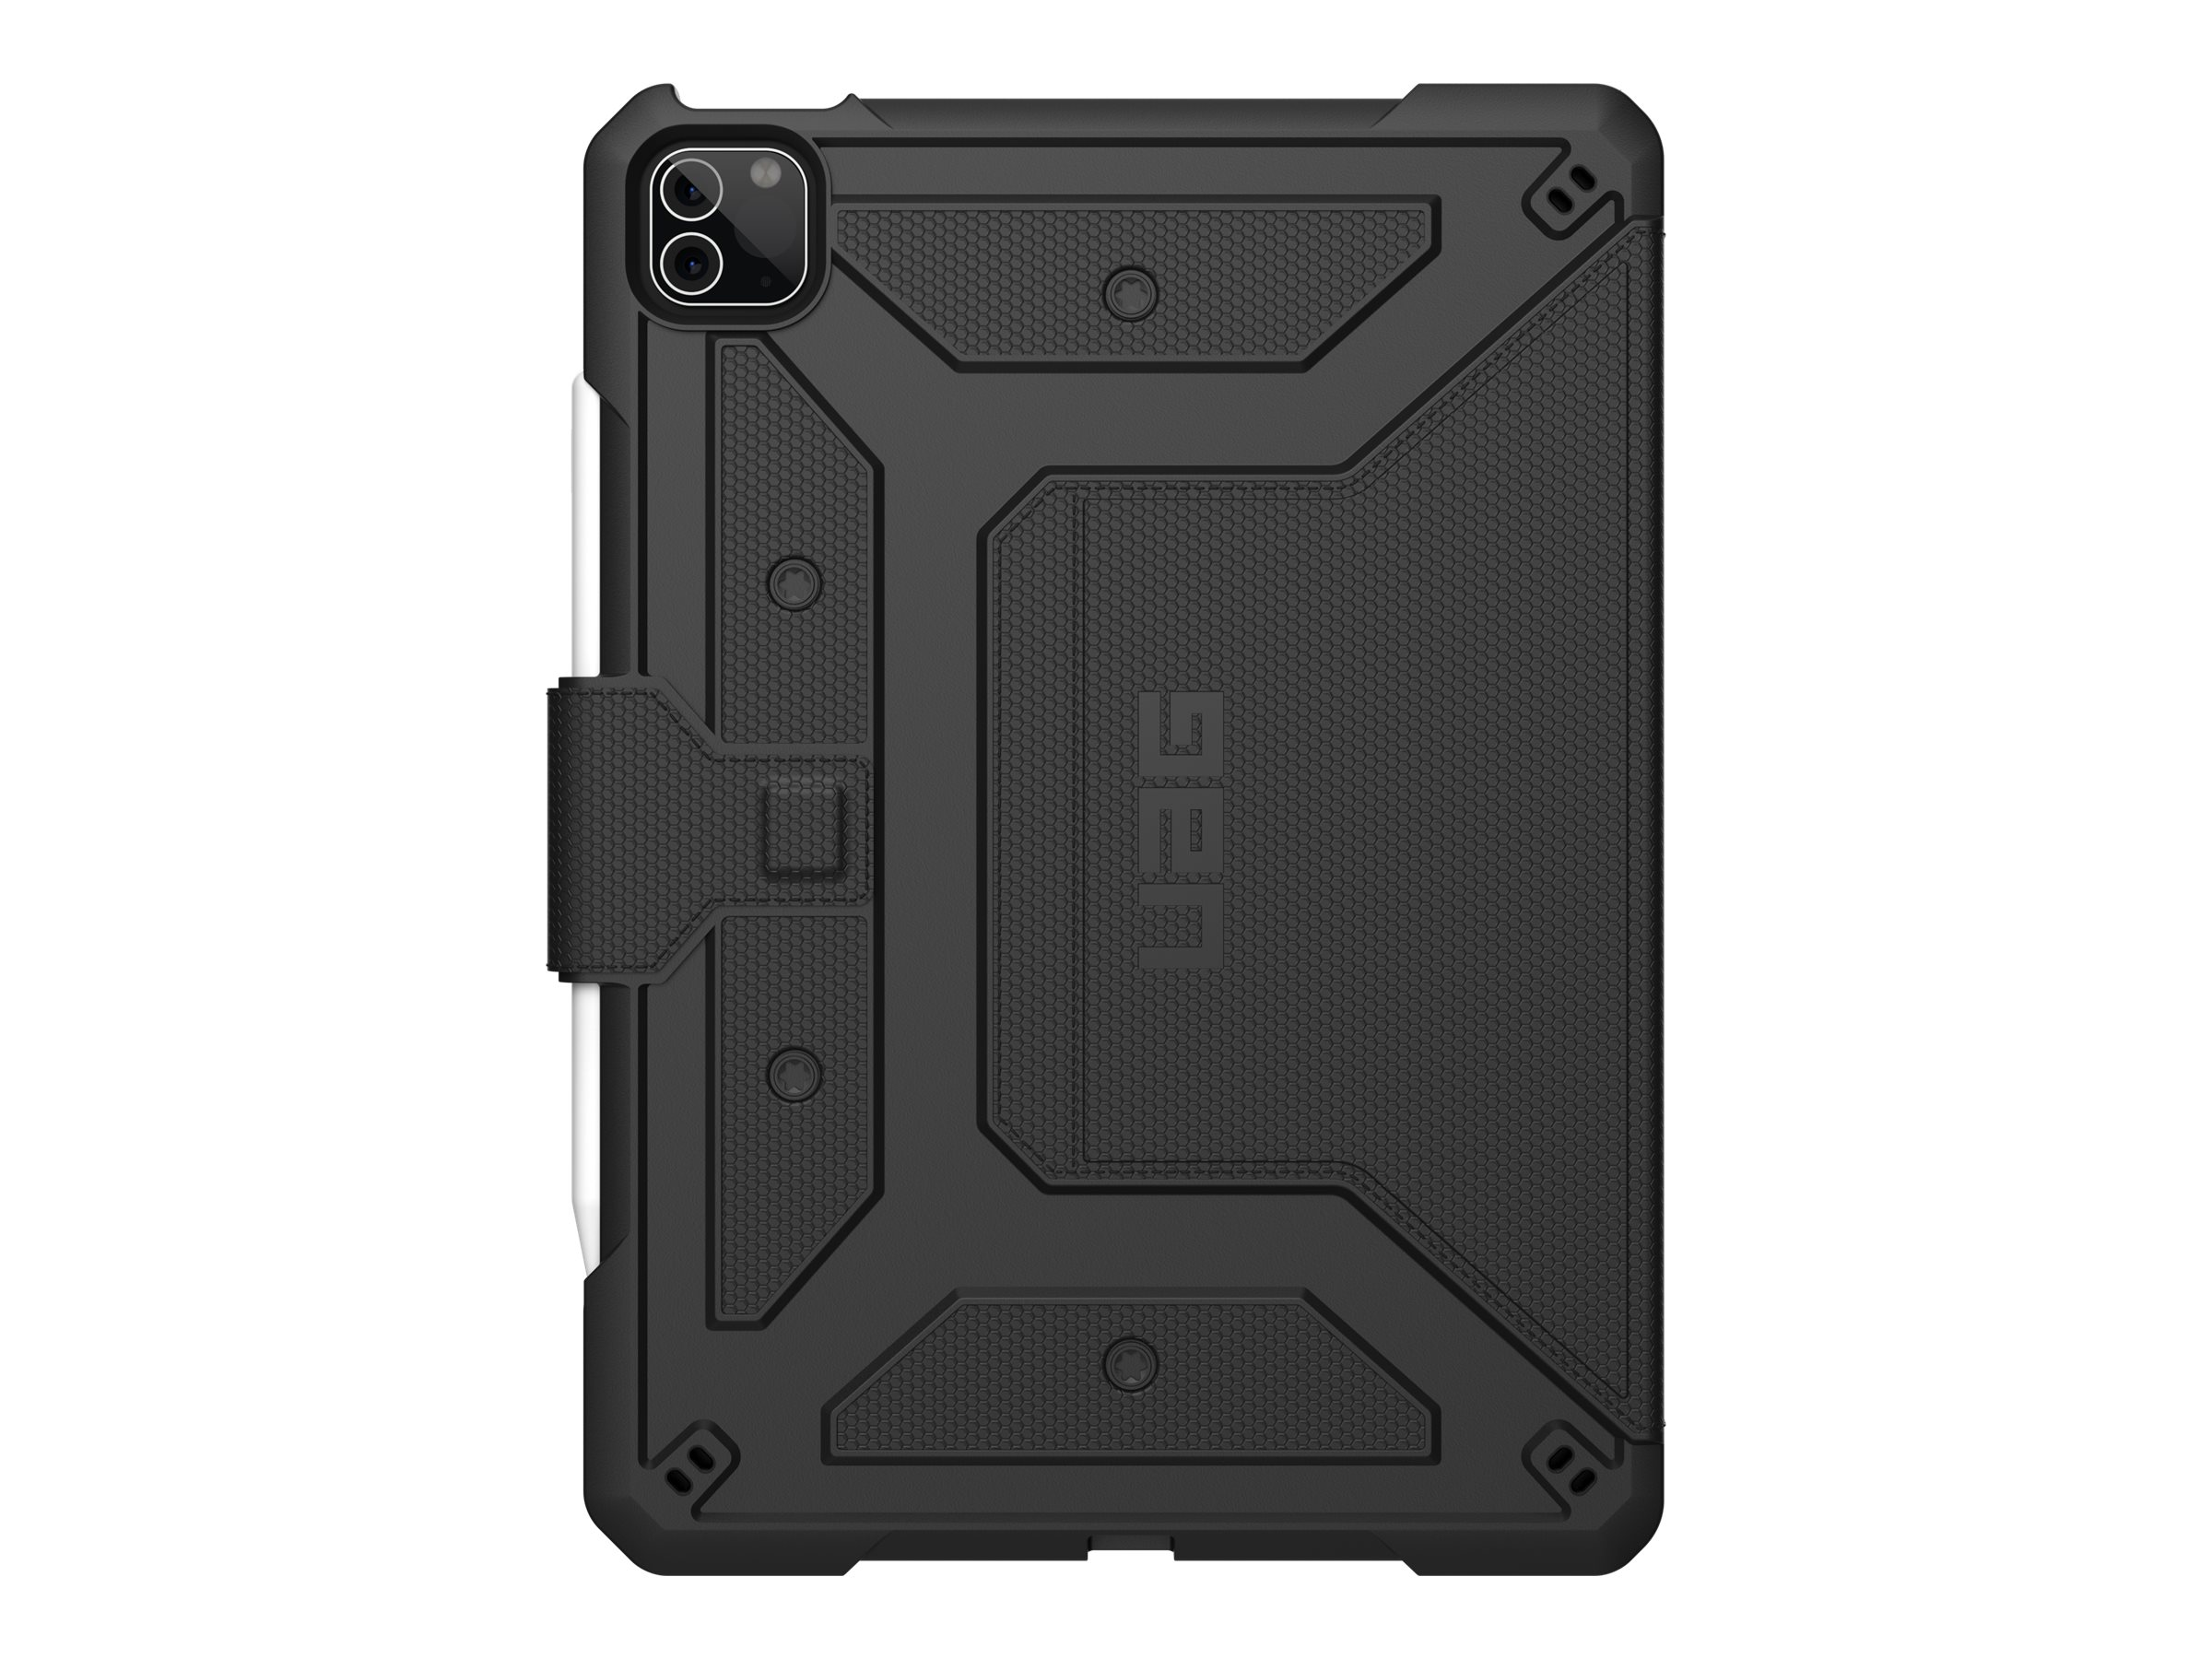 UAG Rugged Case for iPad Pro 11-in (3rd Gen, 2021) - Metropolis Black - Flip-Hülle für Tablet - widerstandsfähig - Schwarz - 27.